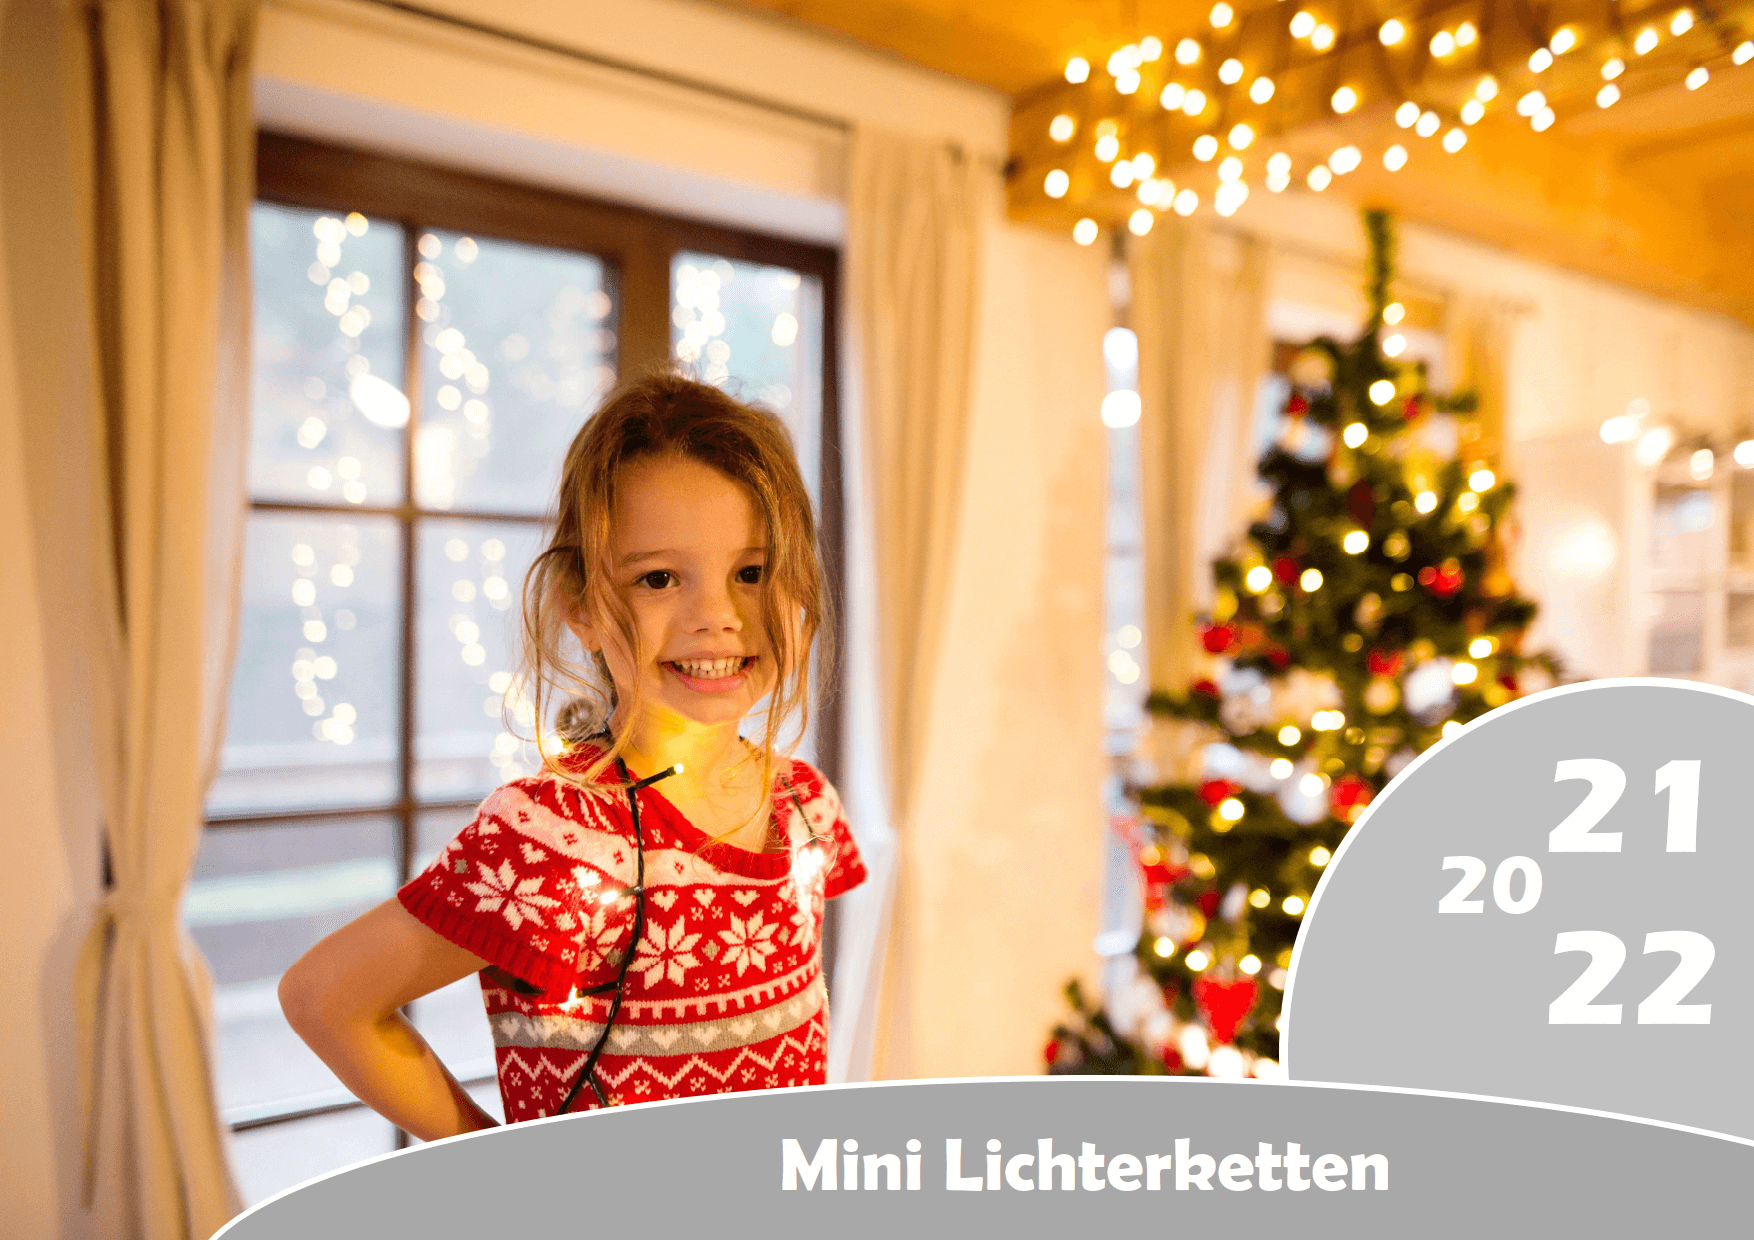 mini-lichterketten_Weihnachtskatalog-2021_1